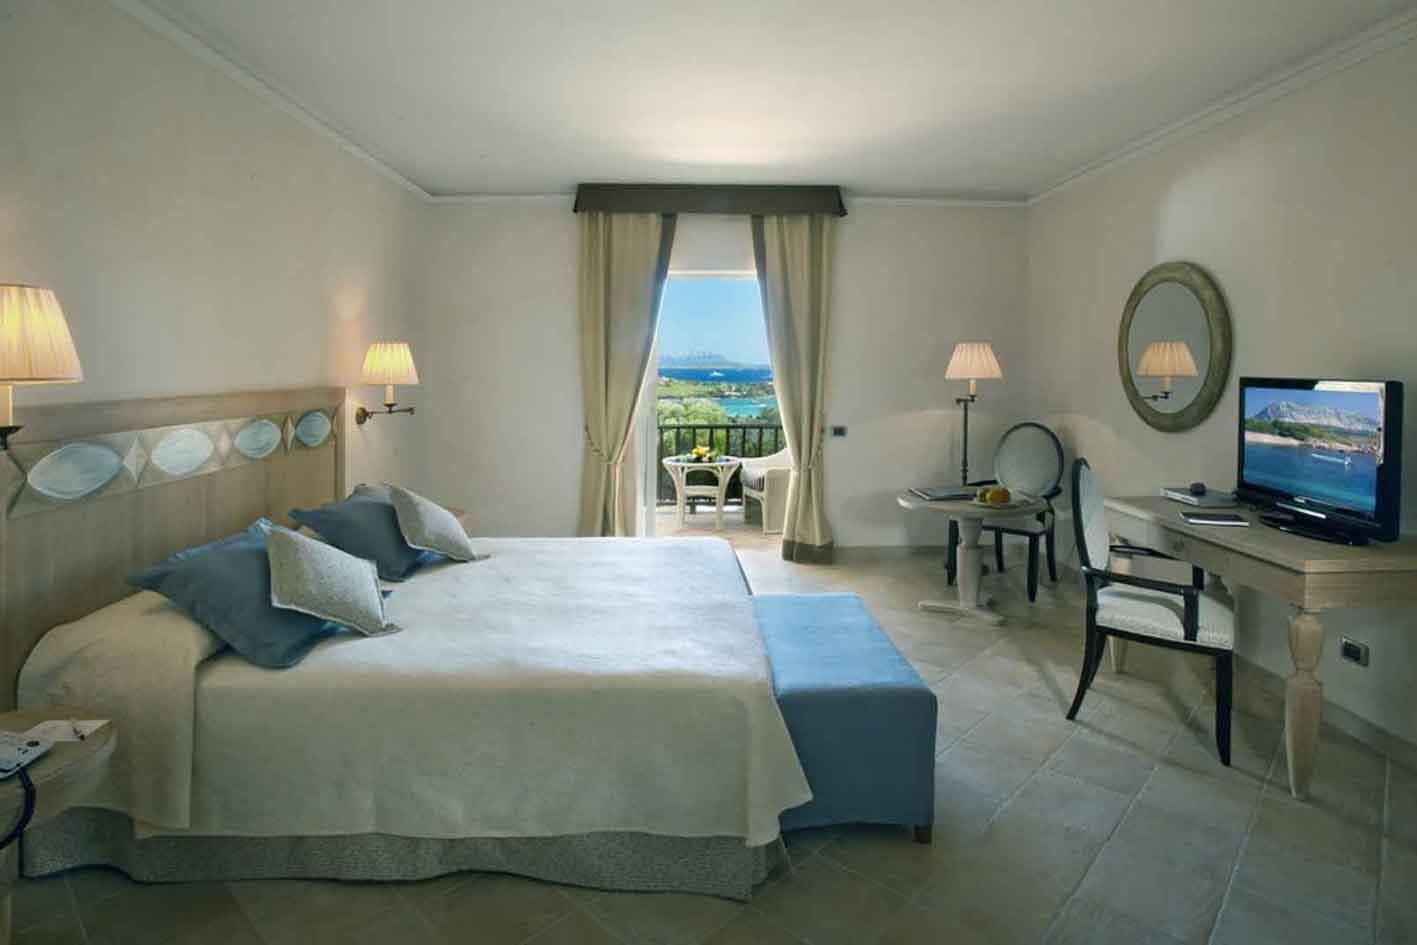 Hotel Petra Bianca - am Golfplatz, mit Strand